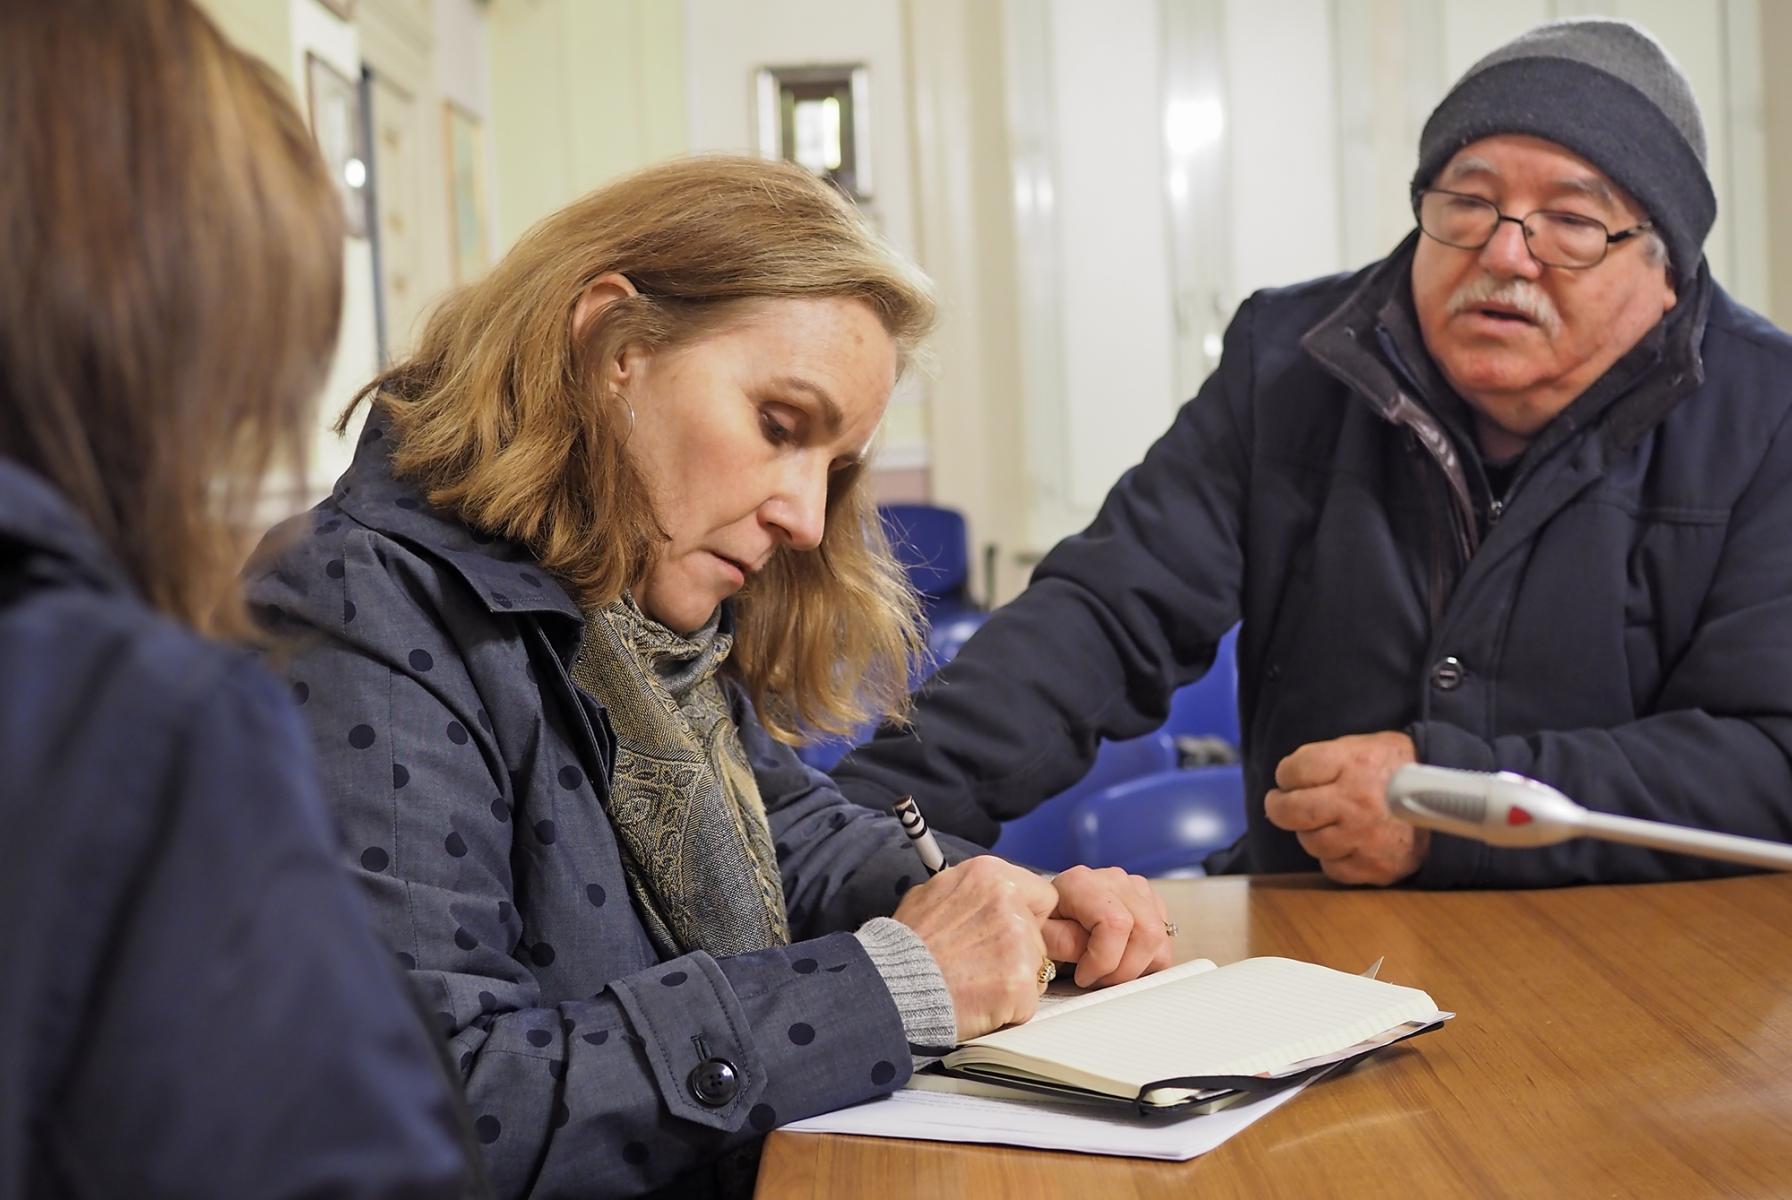 Caitlin interviews a local historian in Calabria.